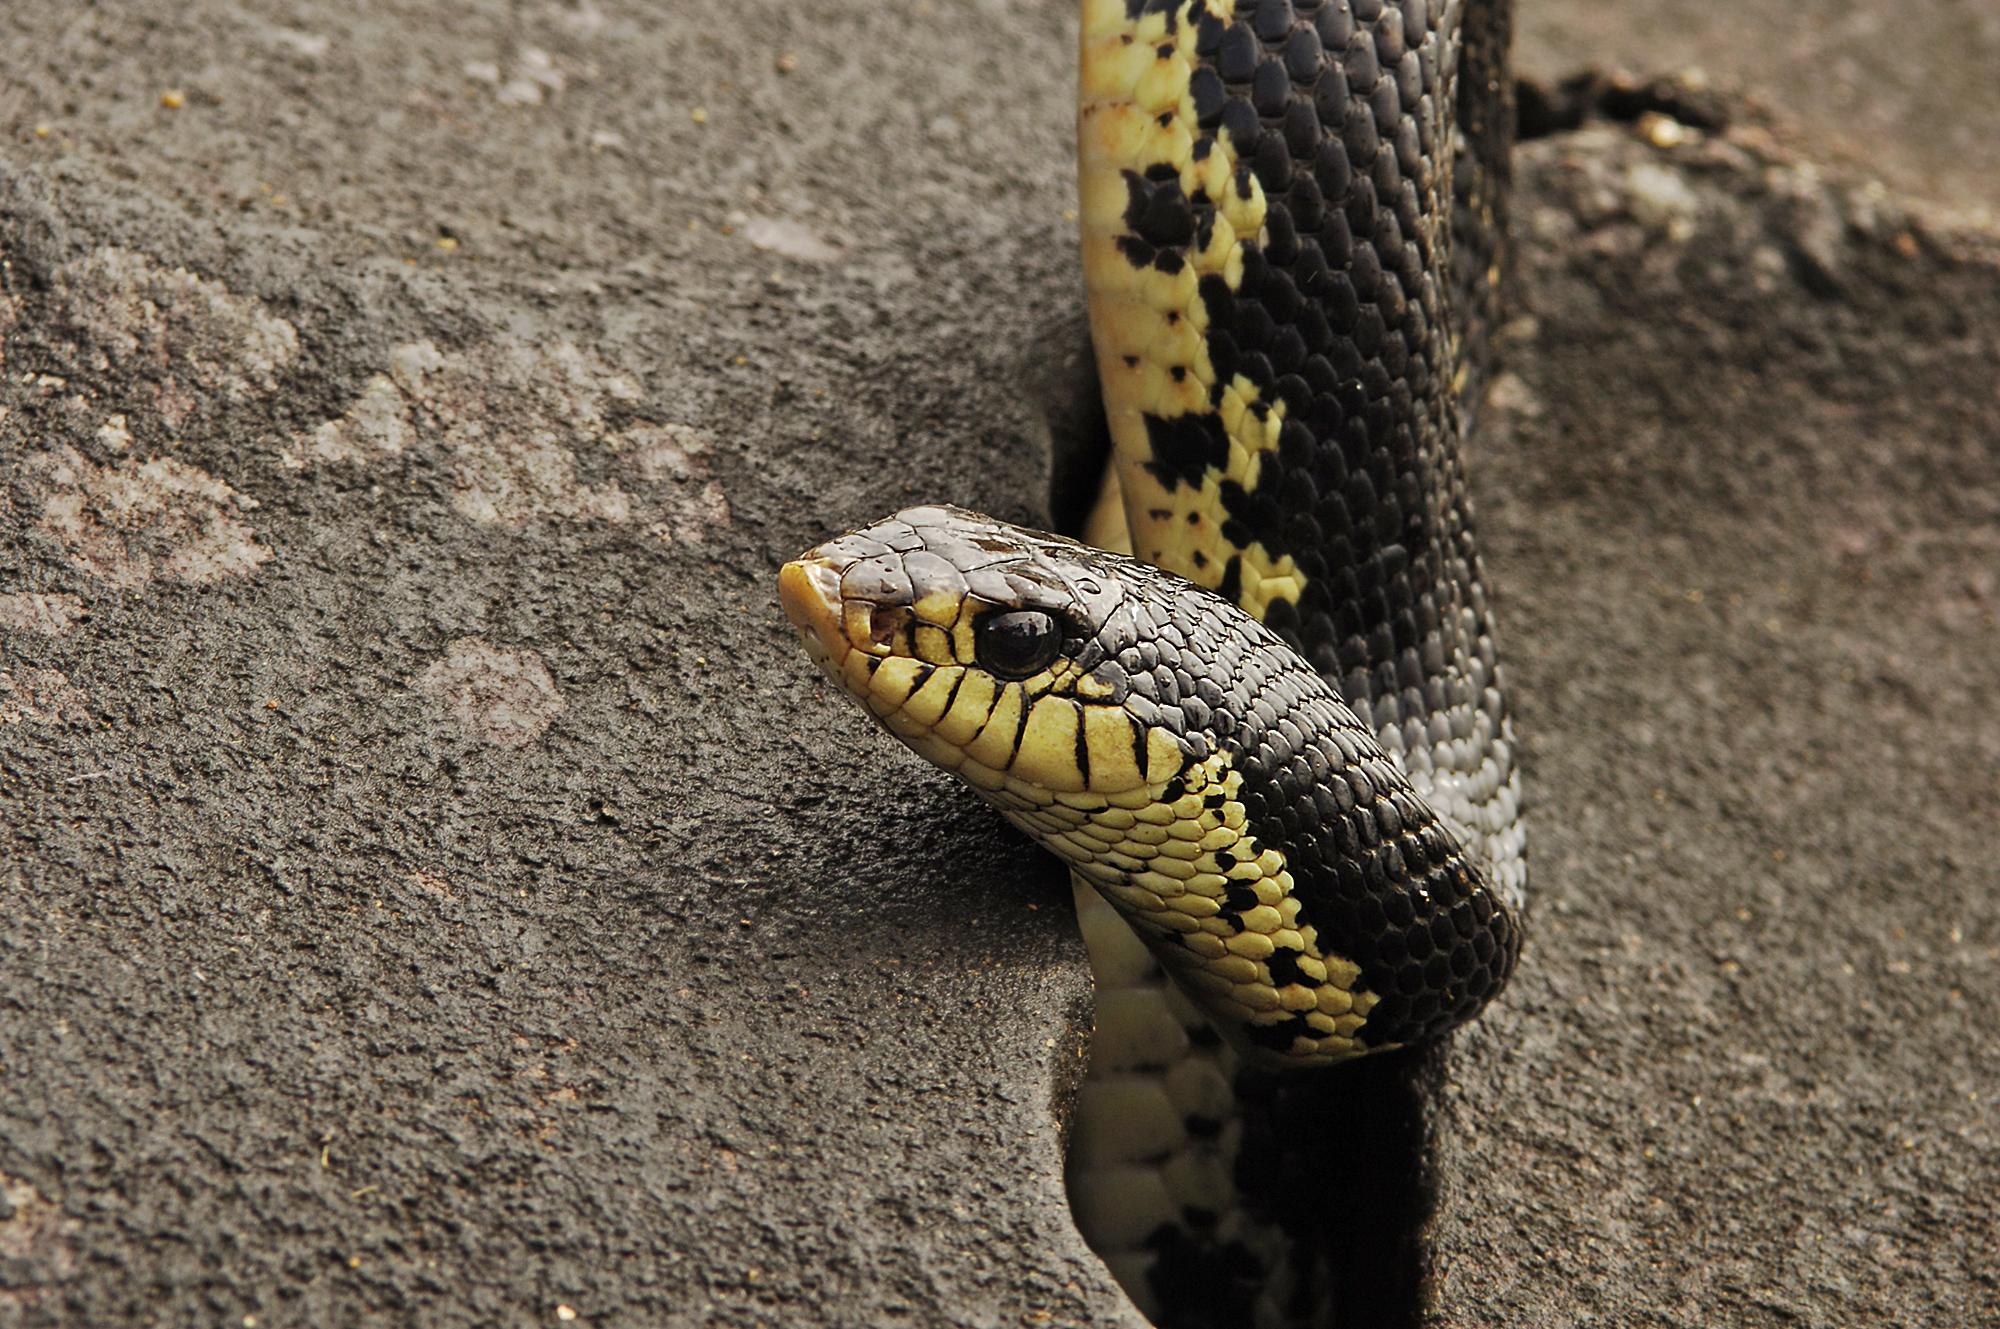 Mad About Hognose Snakes